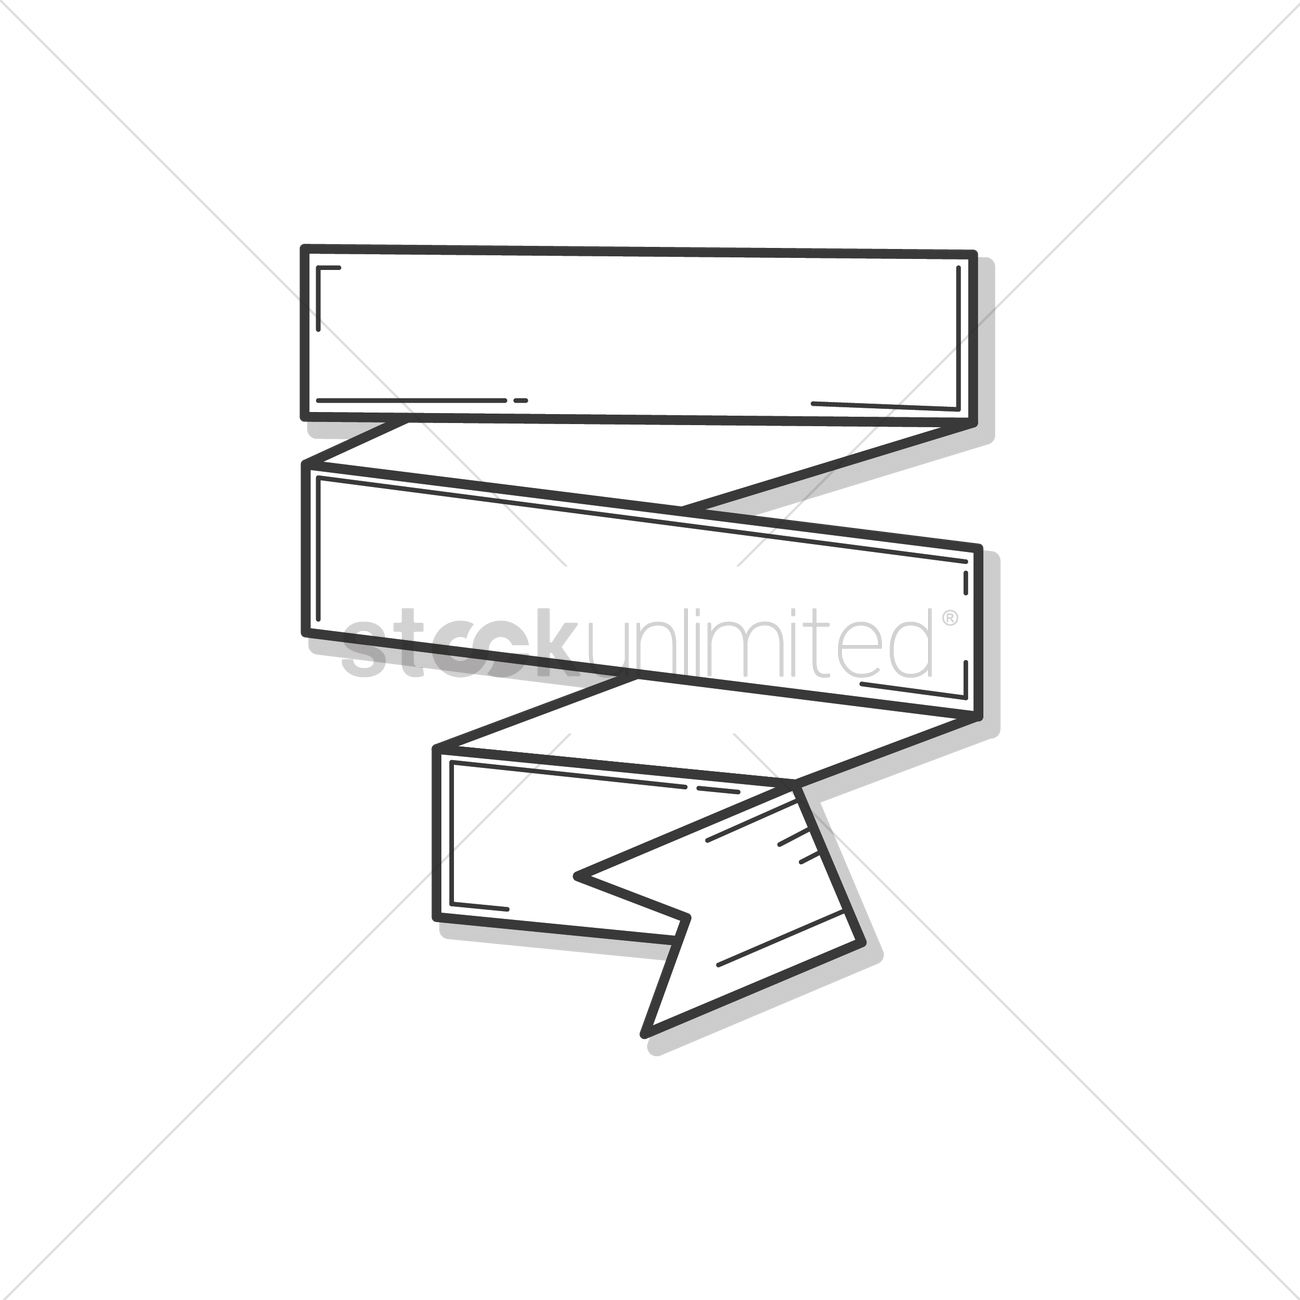 1300x1300 Ribbon Banner Outline Design Vector Image